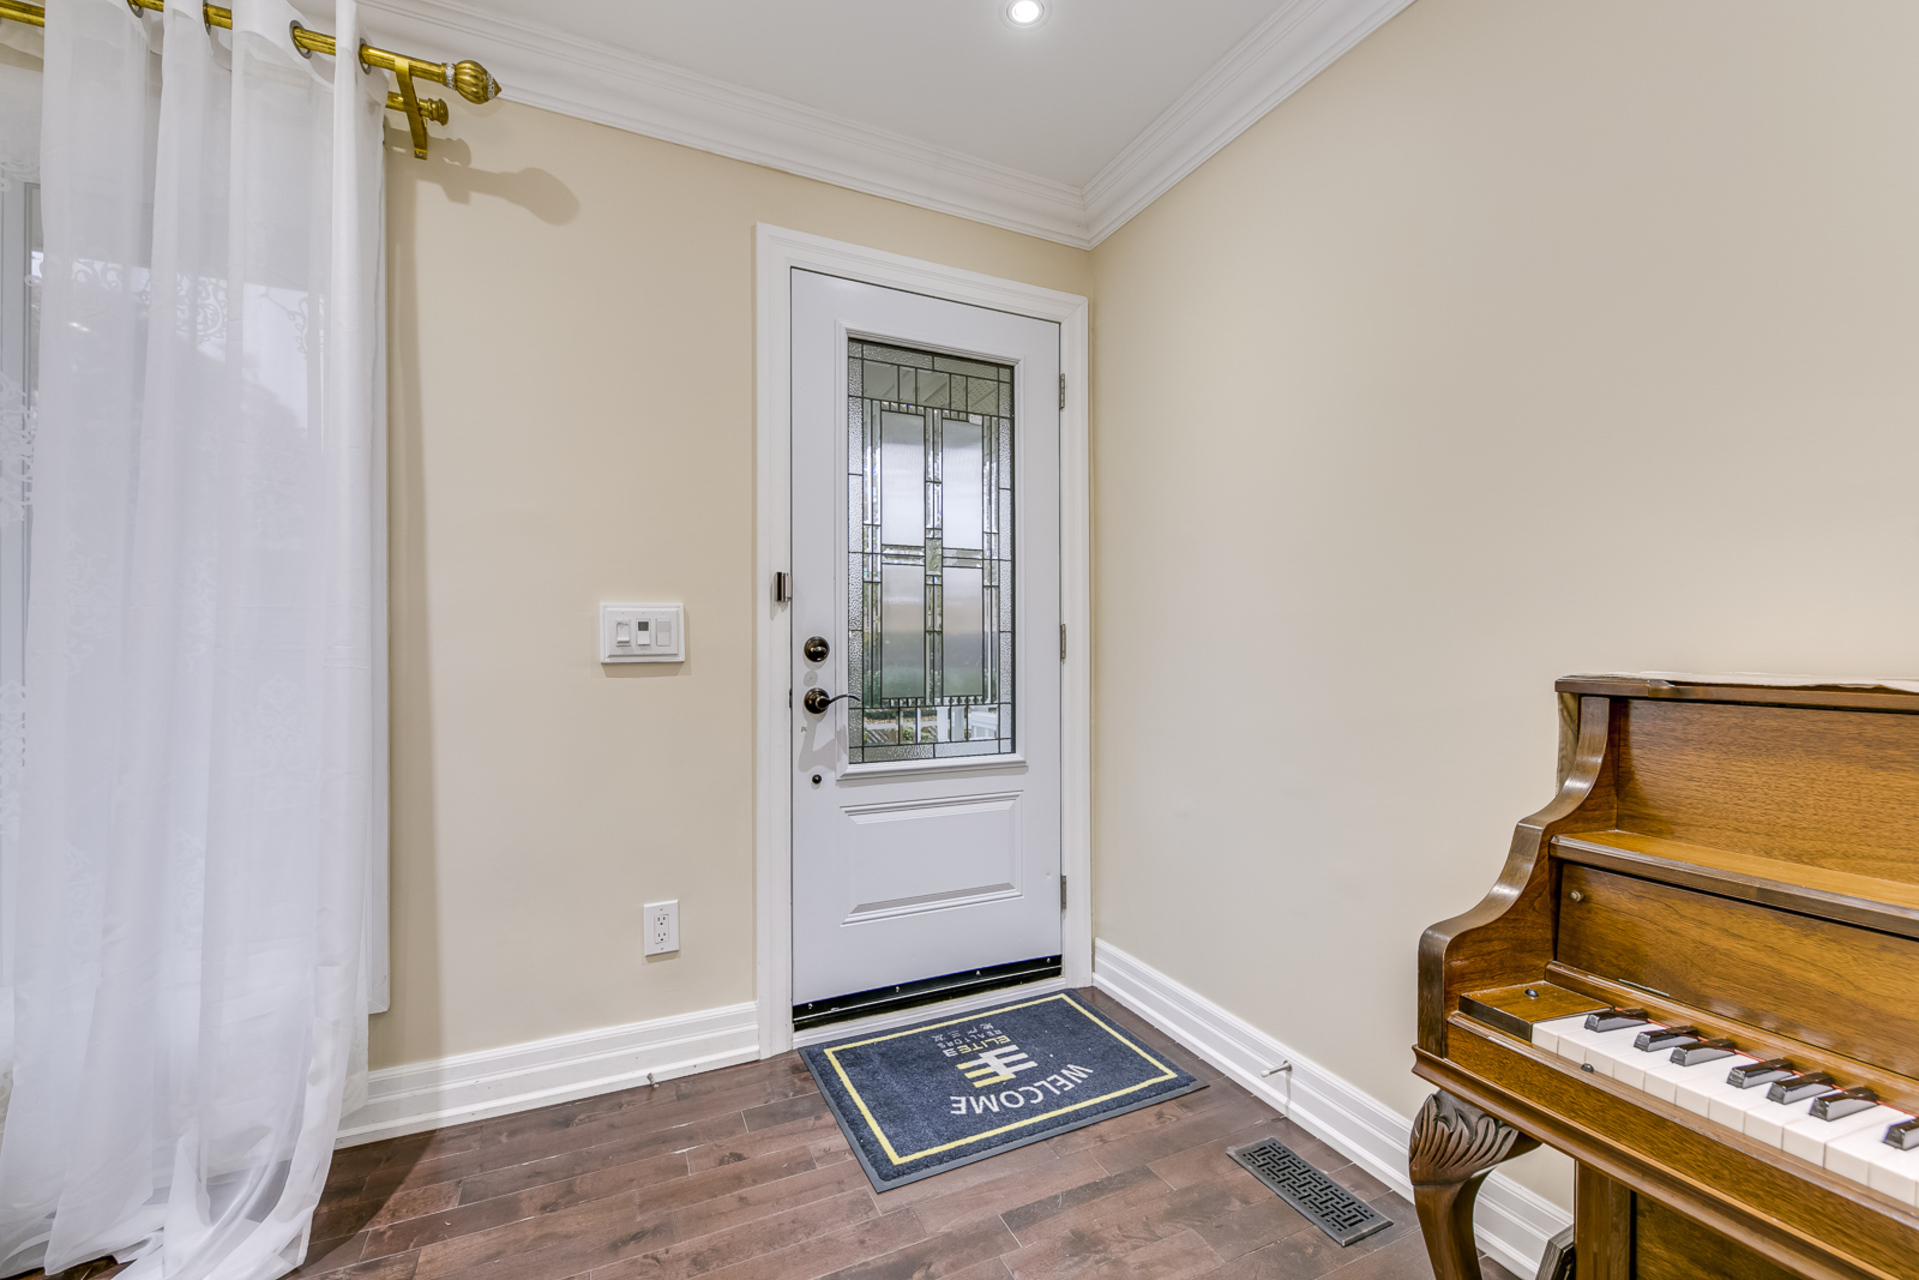 Foyer Room - 2058 Constance Dr, Oakville - Elite3 & Team at 2058 Constance Drive, Eastlake, Oakville